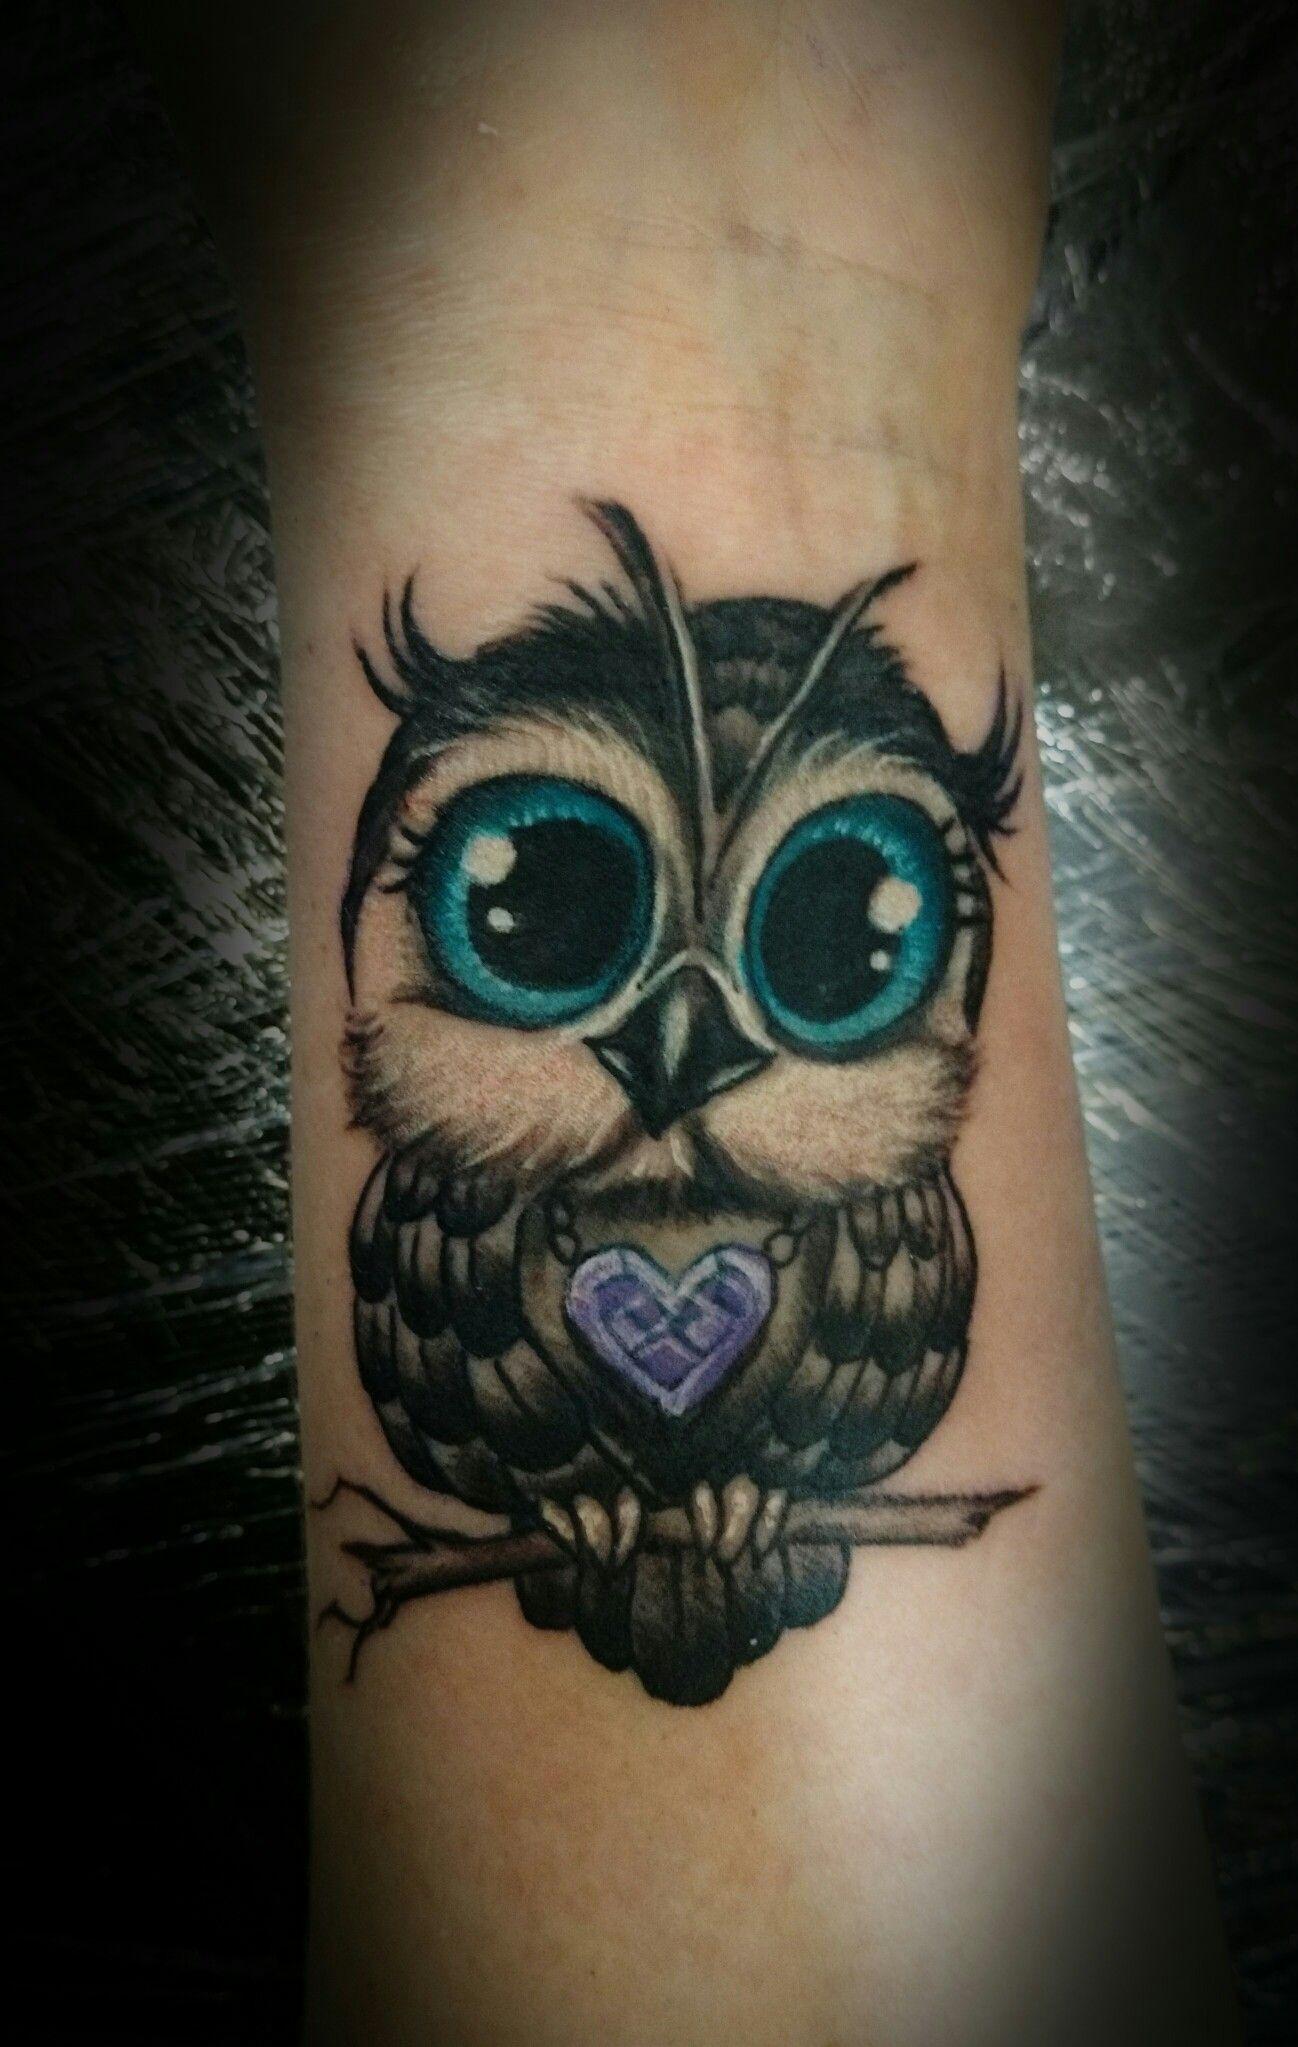 Baby Owl Tattoo Tatouage Bracelet Cheville Chouette Tatouage